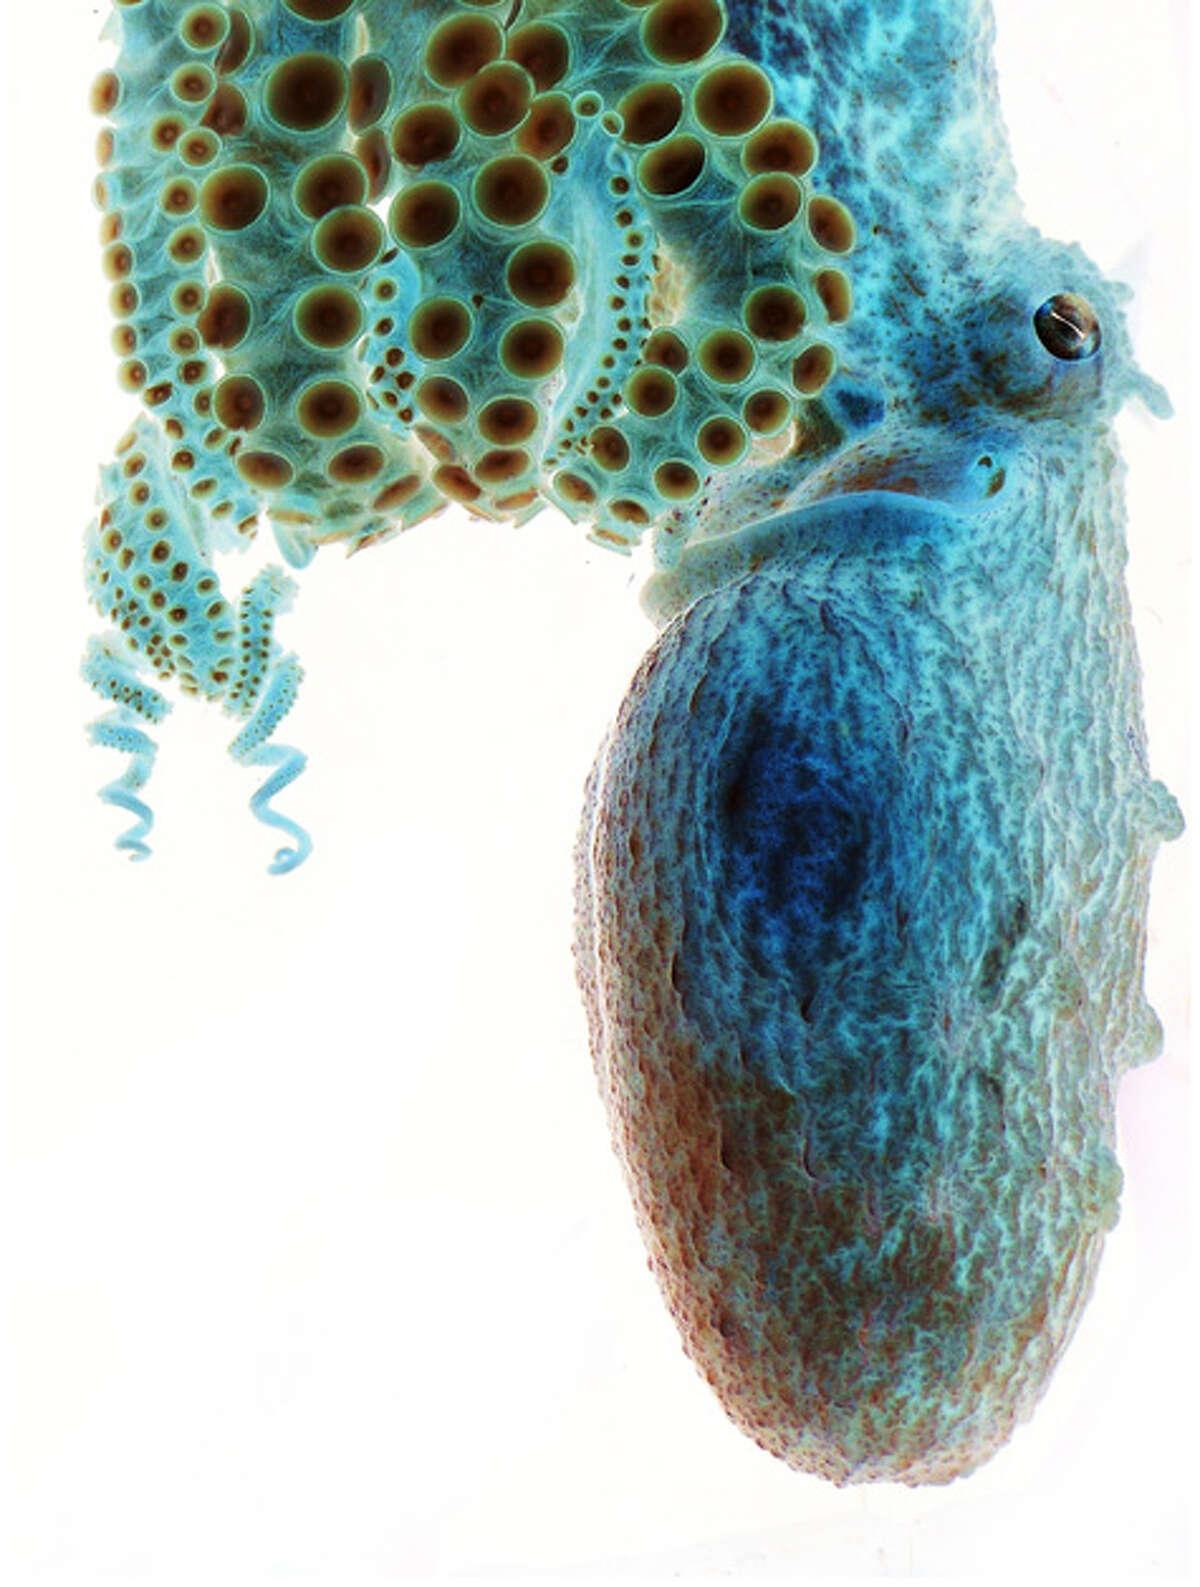 Negative image of an octopus Sarah Jackson (Clanton, Alabama)Photographed February 2009, Atlanta, Georgia